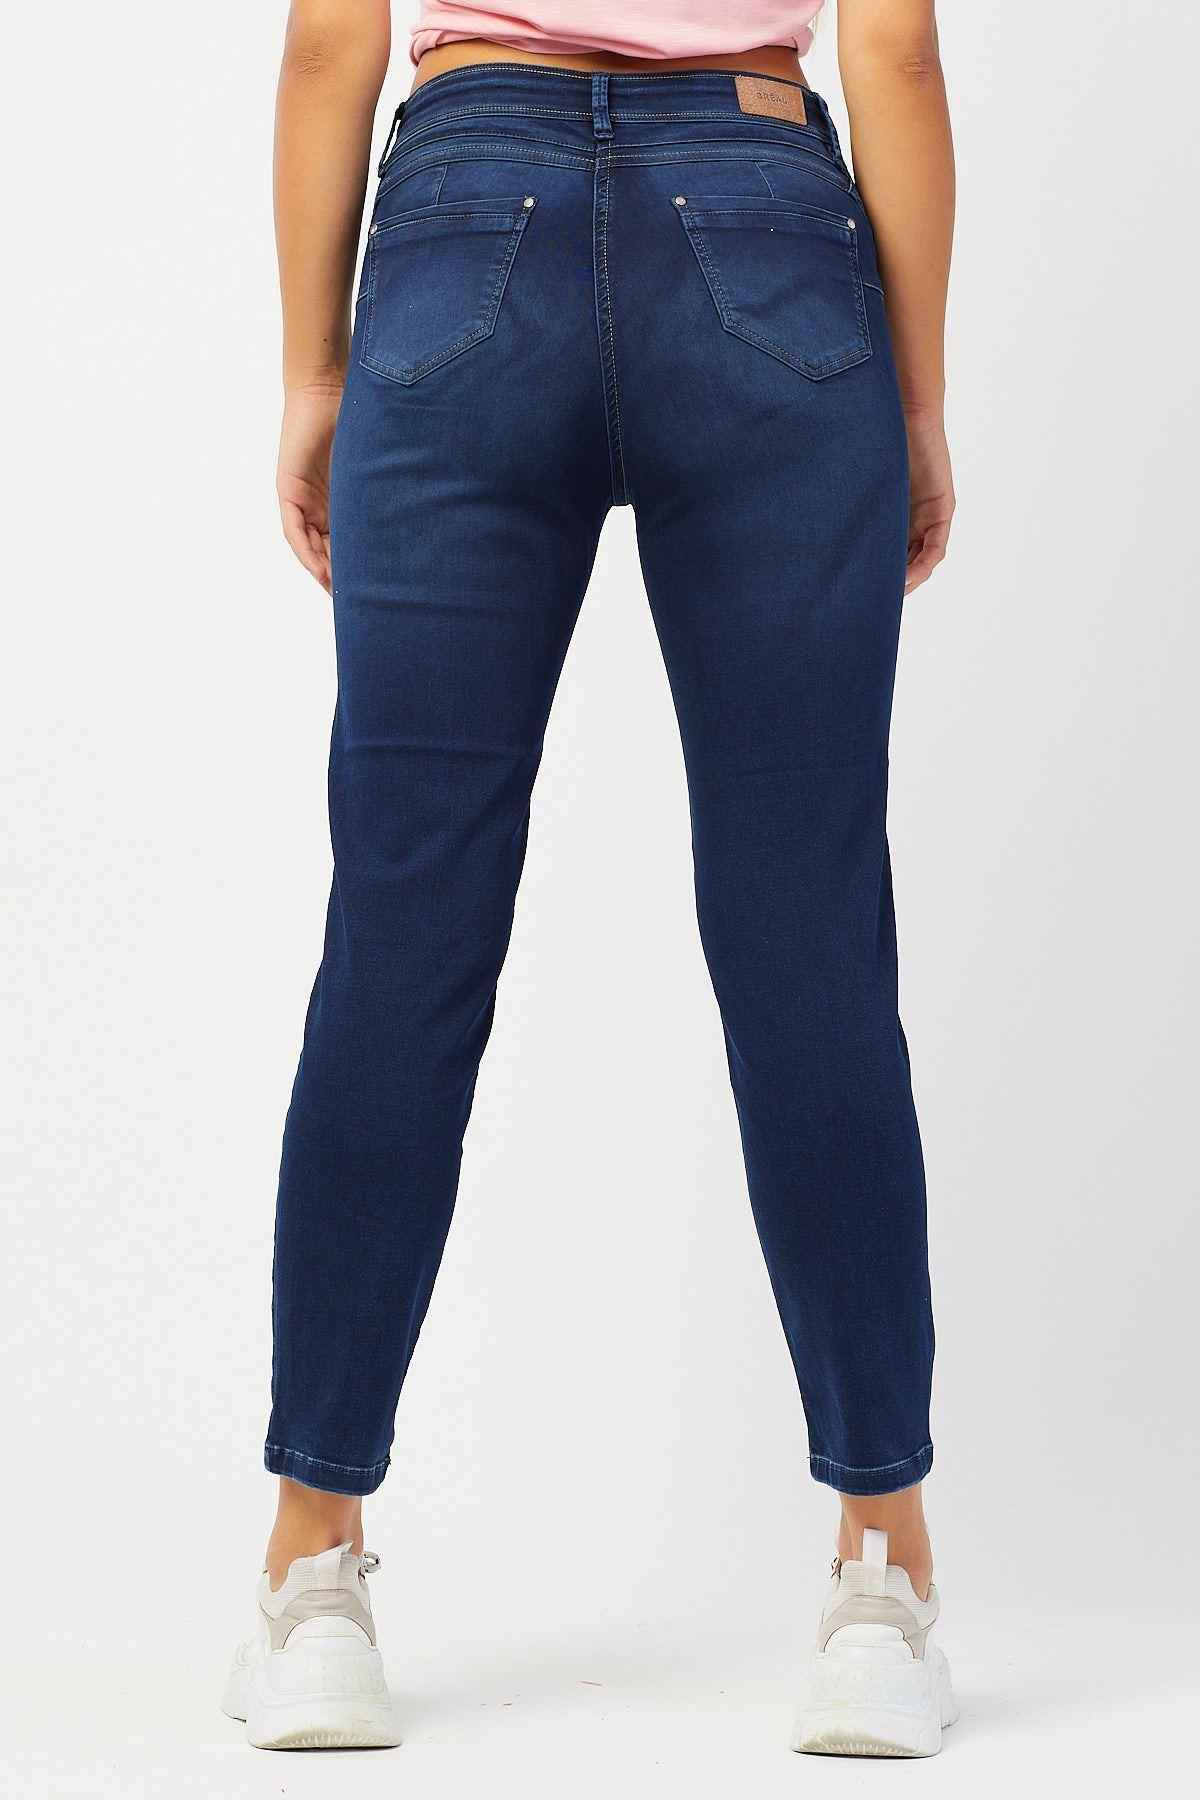 Likralı Yüksek Bel Kot Pantolon